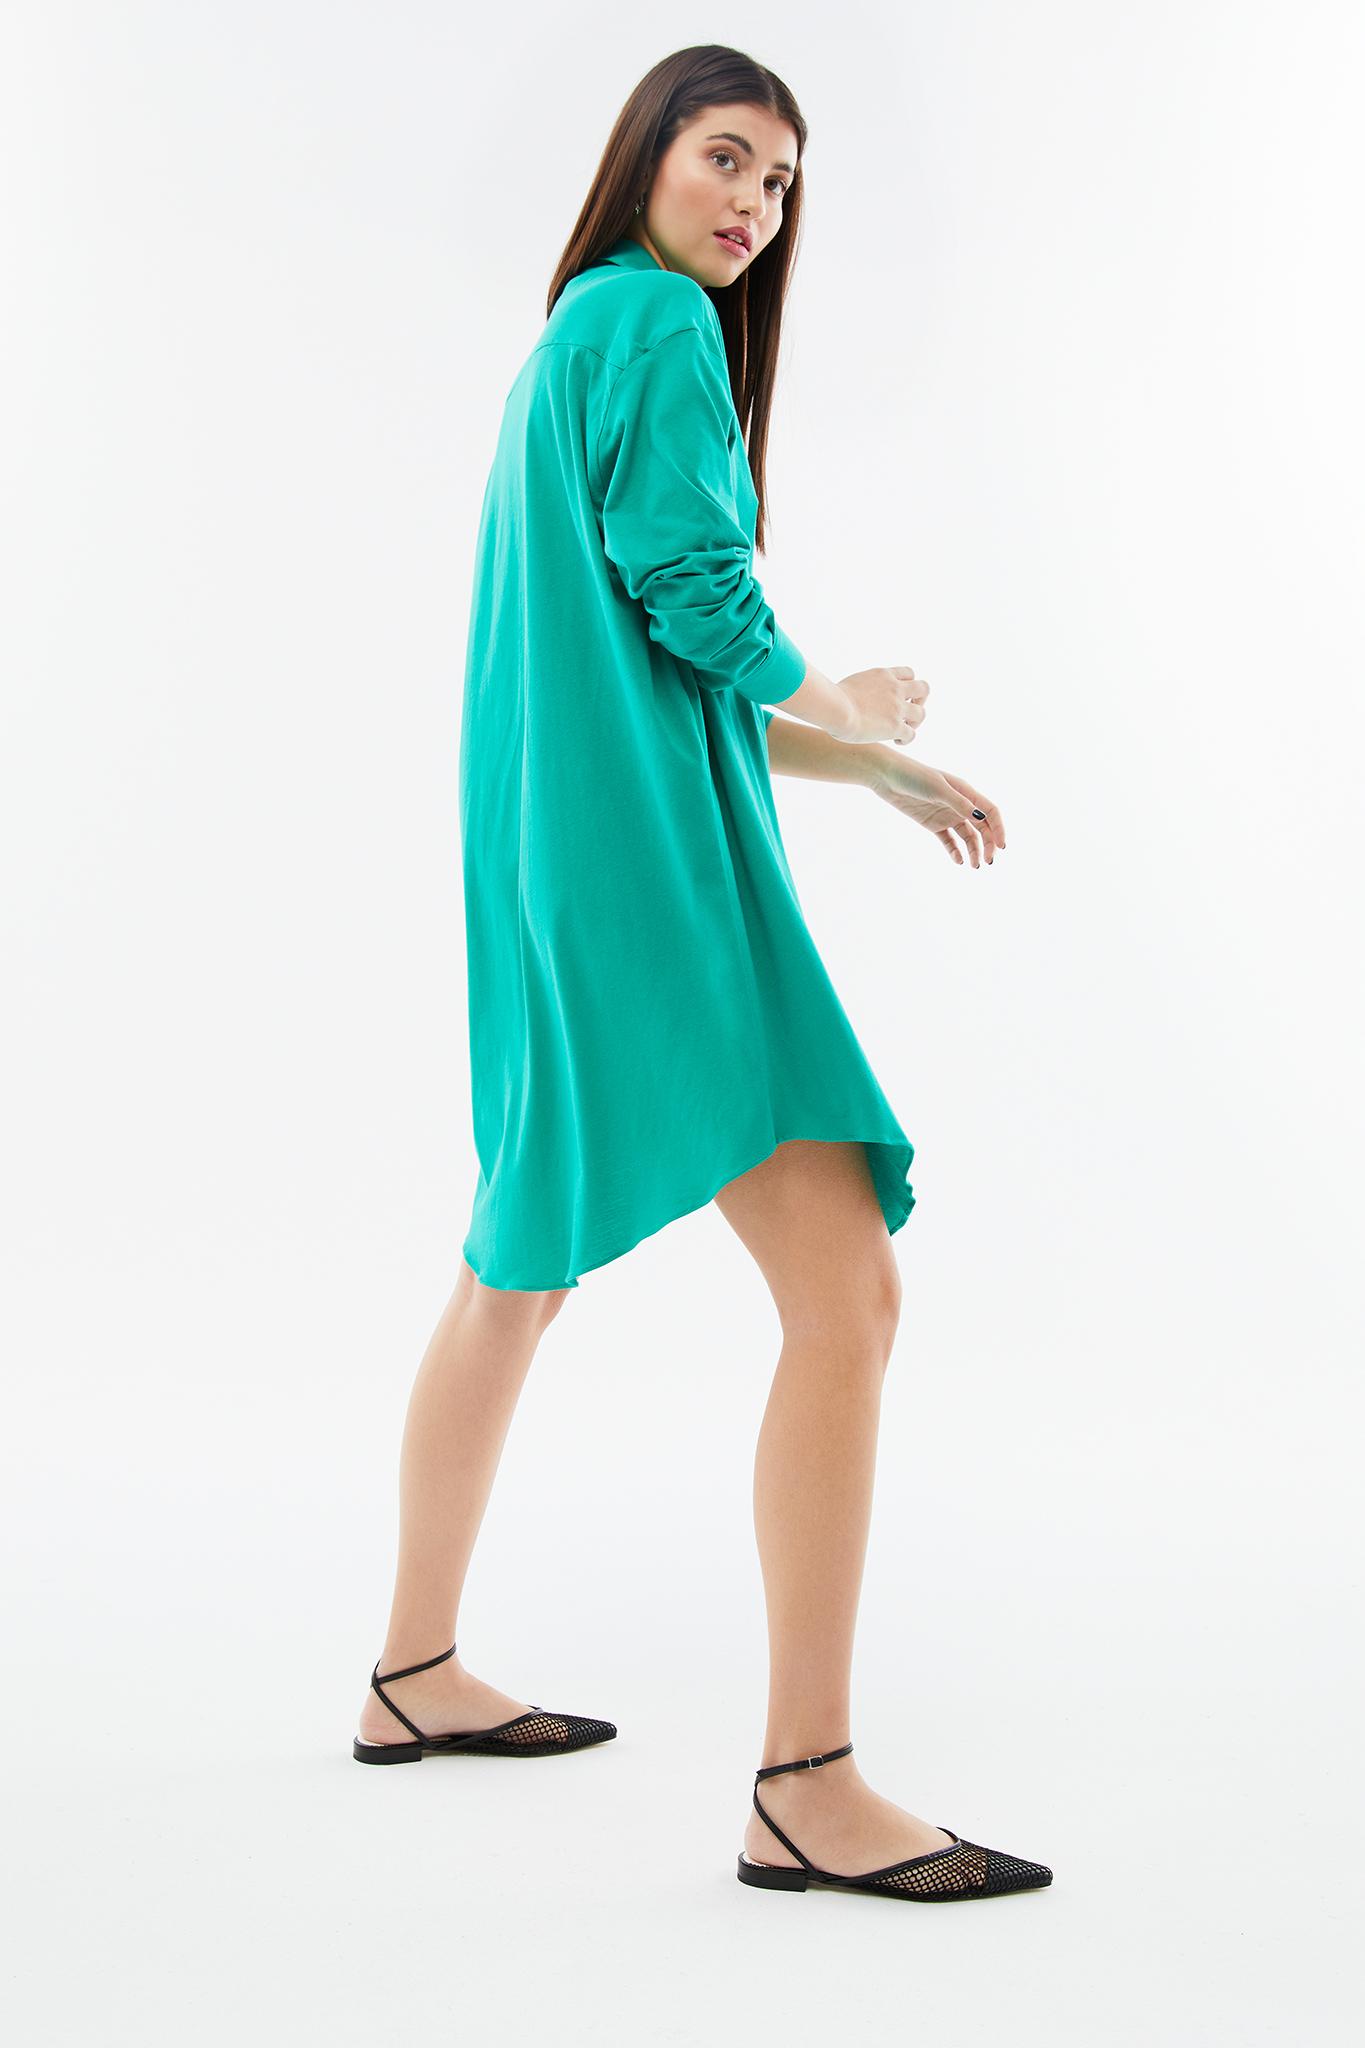 BLAMEYOURDAZE oversized green dress